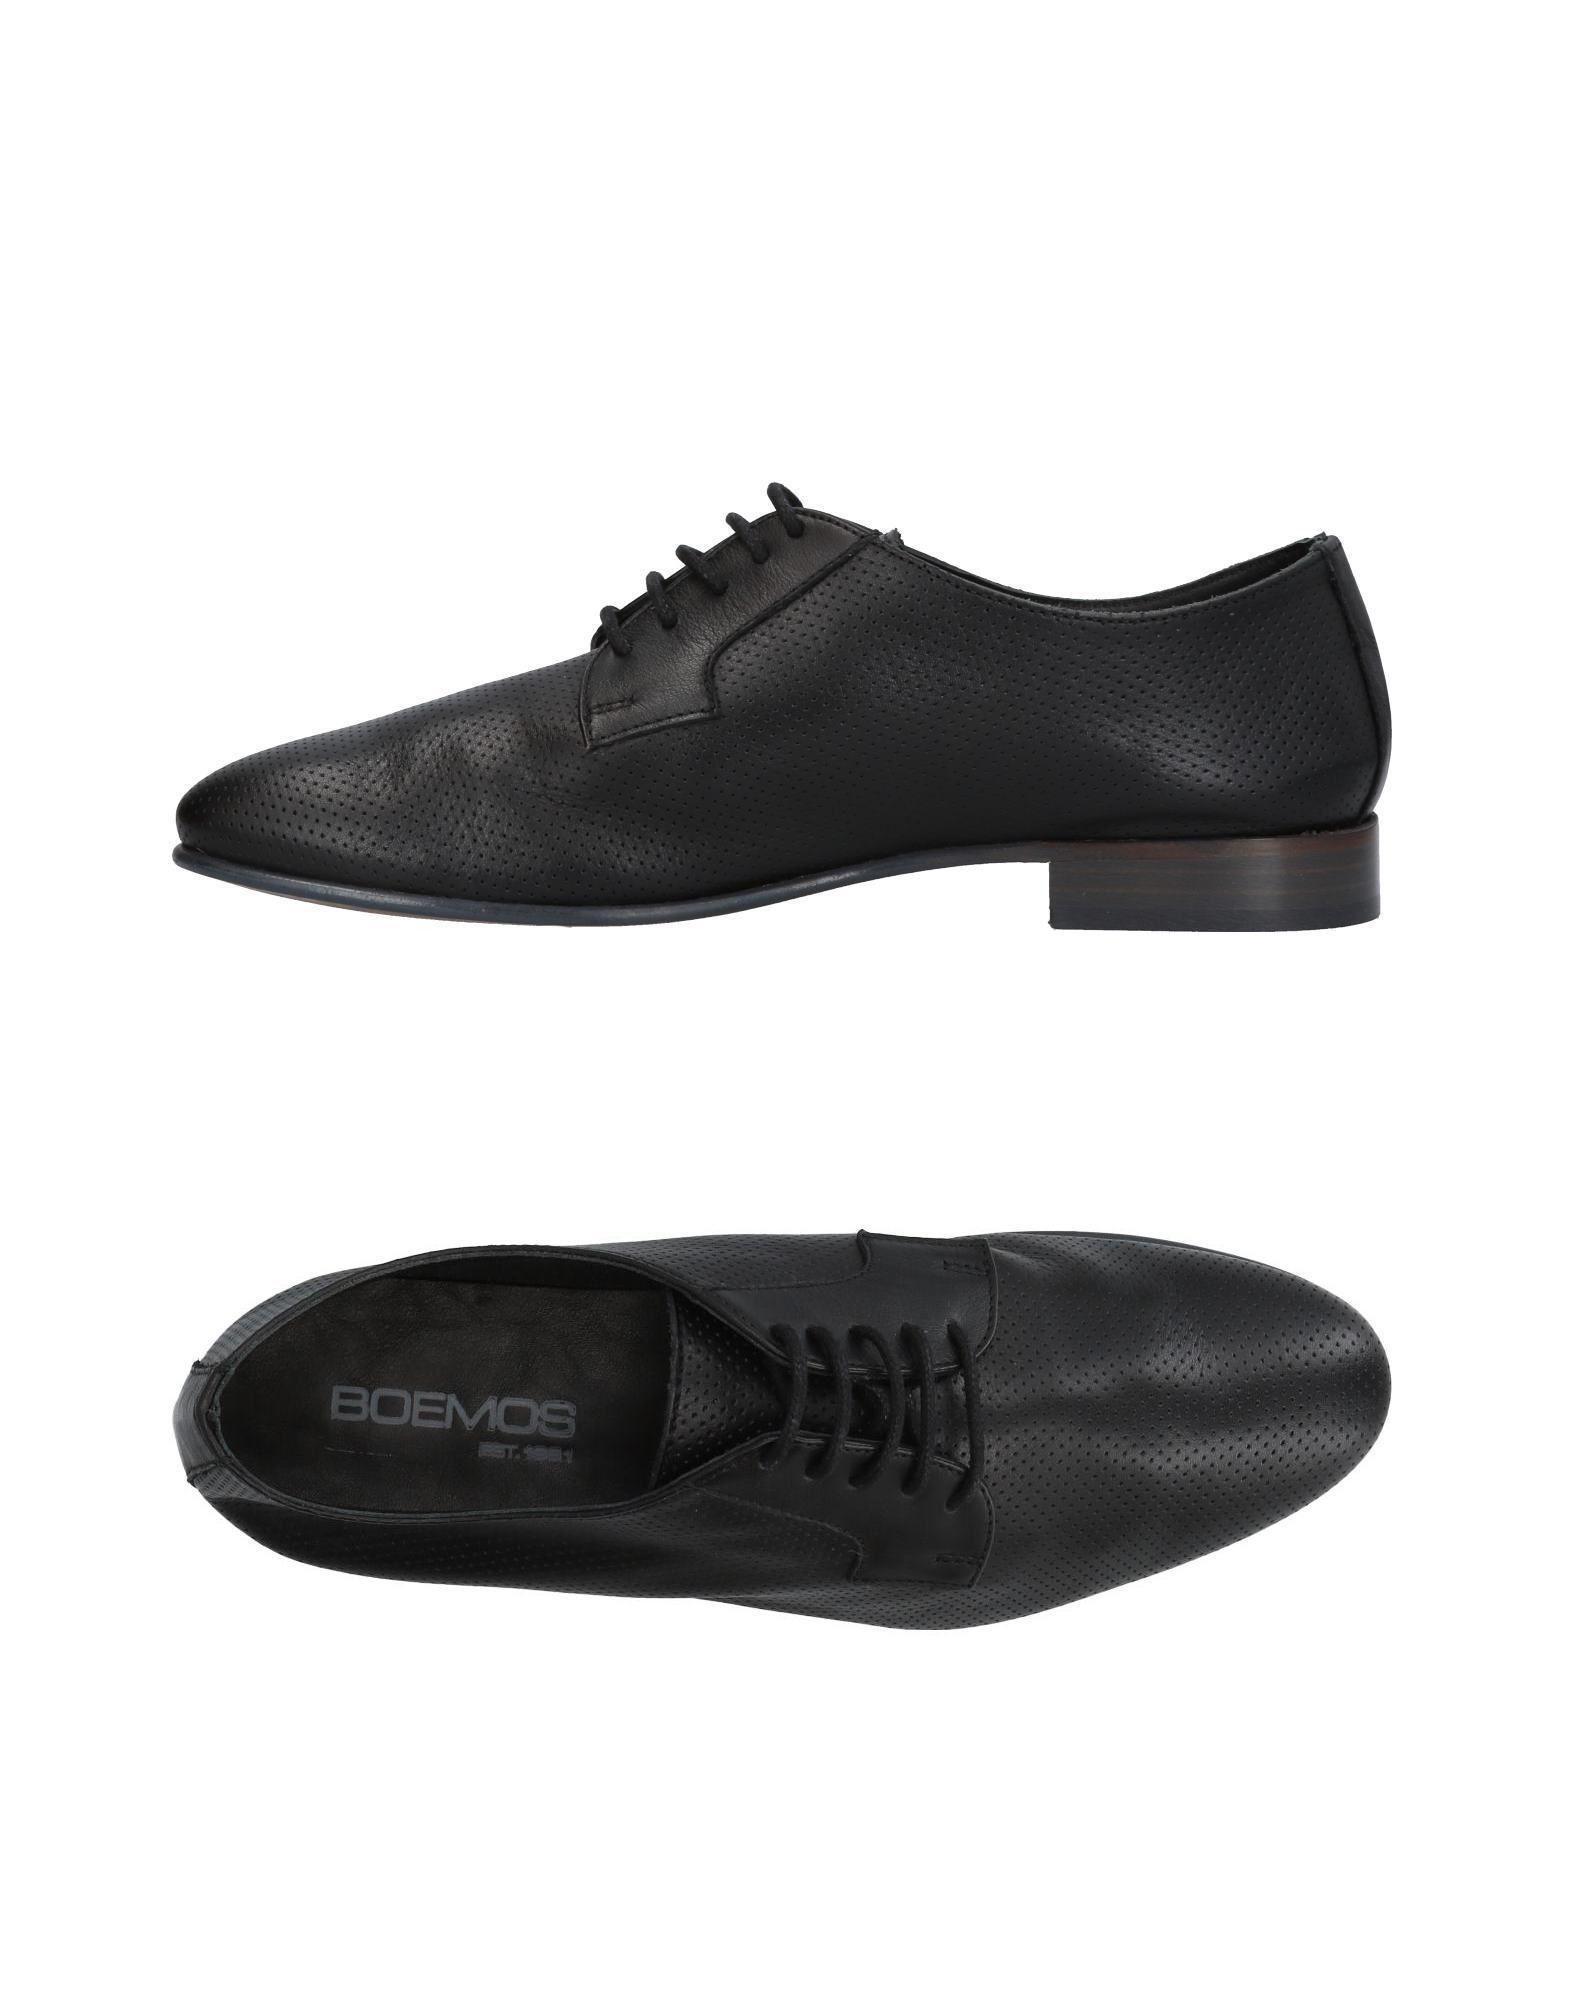 FOOTWEAR - Lace-up shoes Boemos tX70mZjx0g